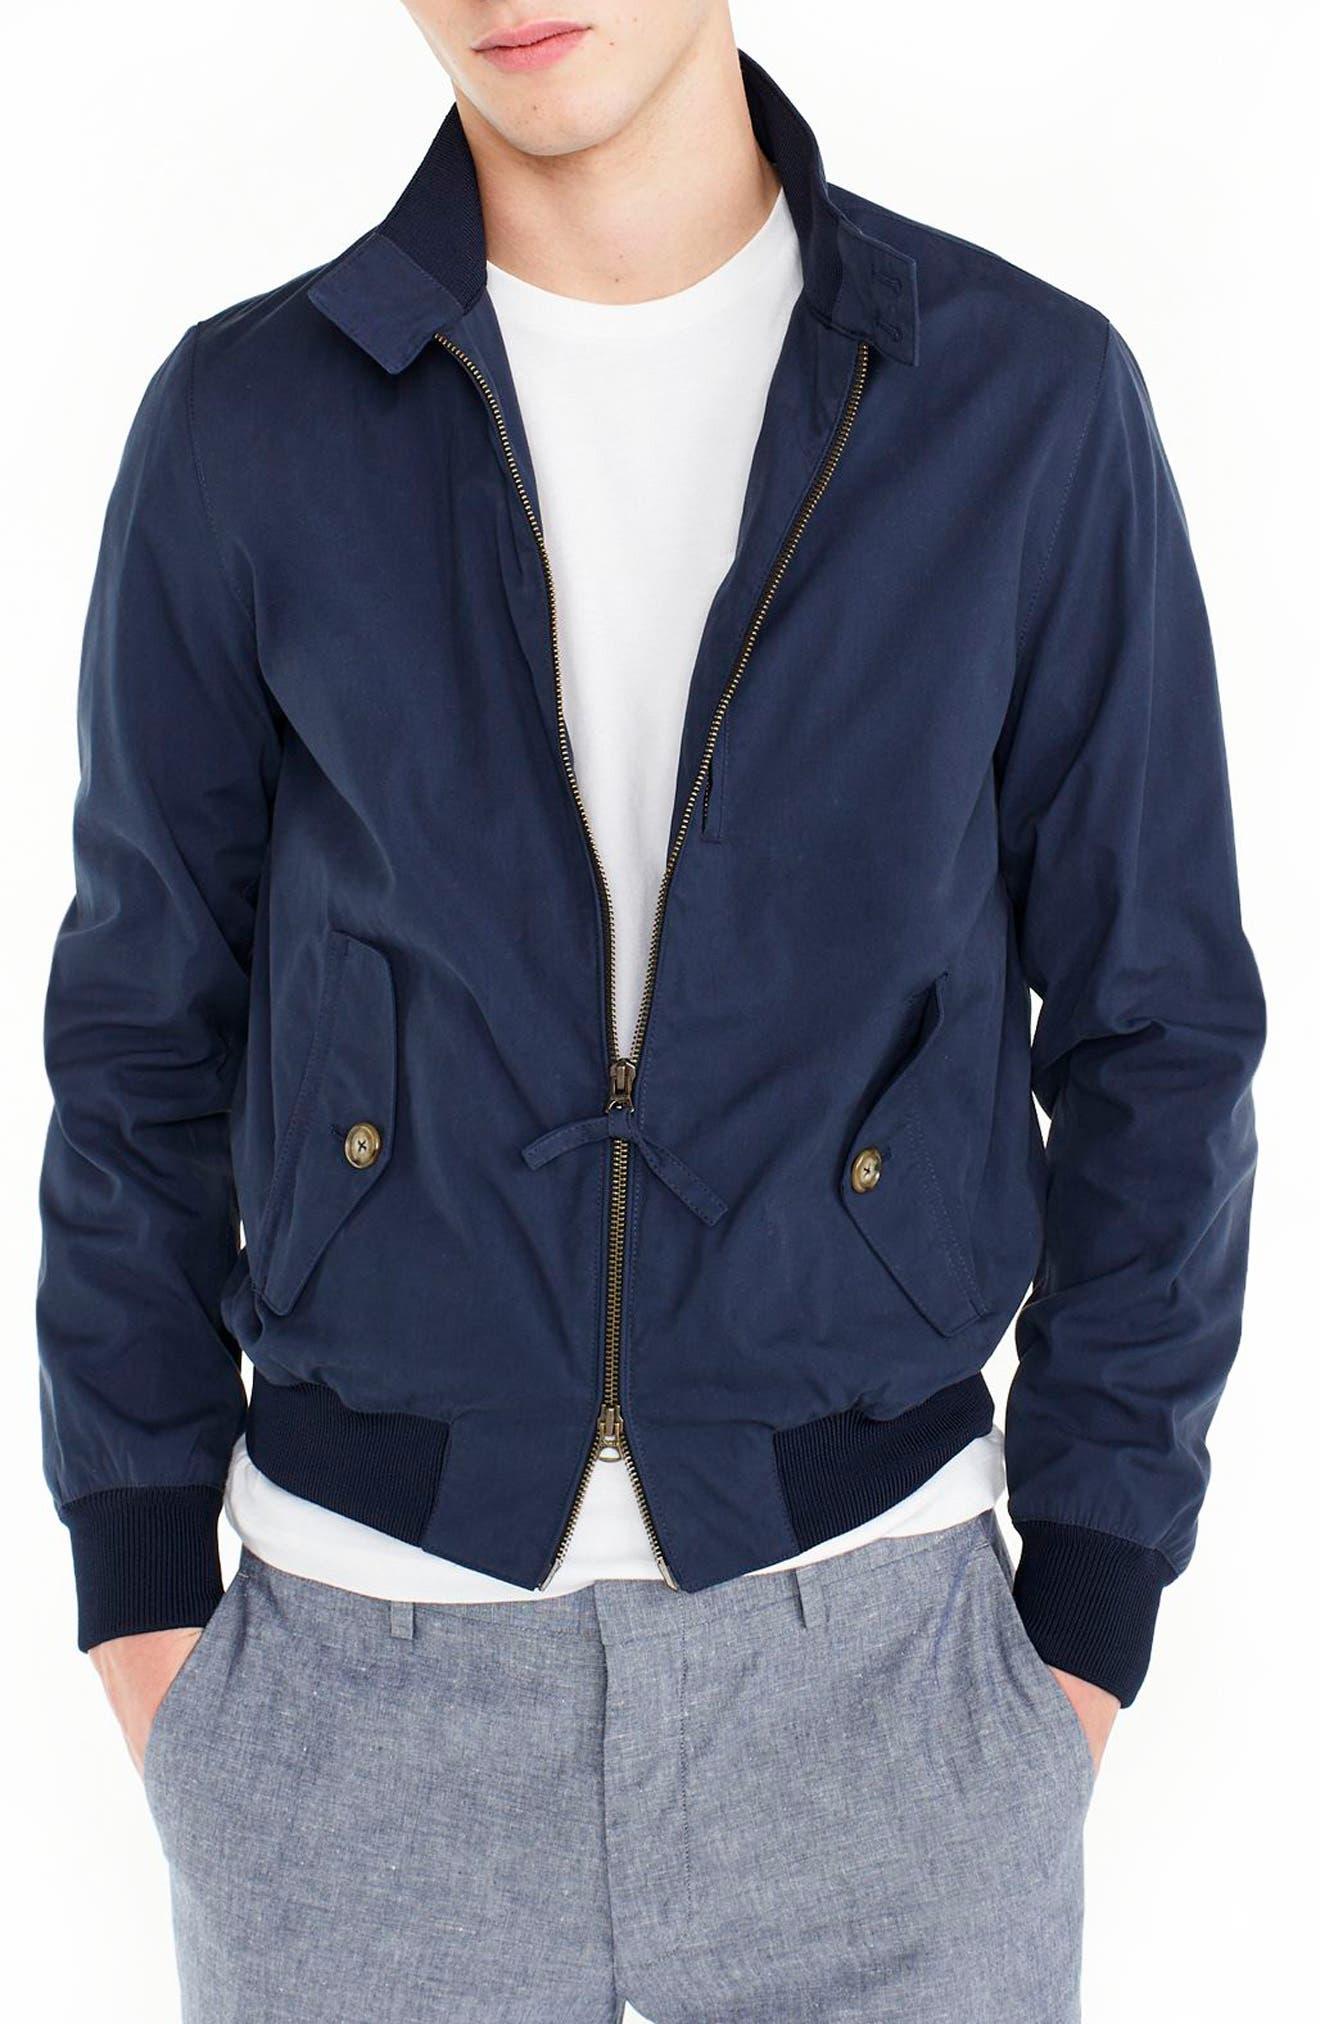 Alternate Image 1 Selected - J.Crew Slim Fit Harrington Jacket